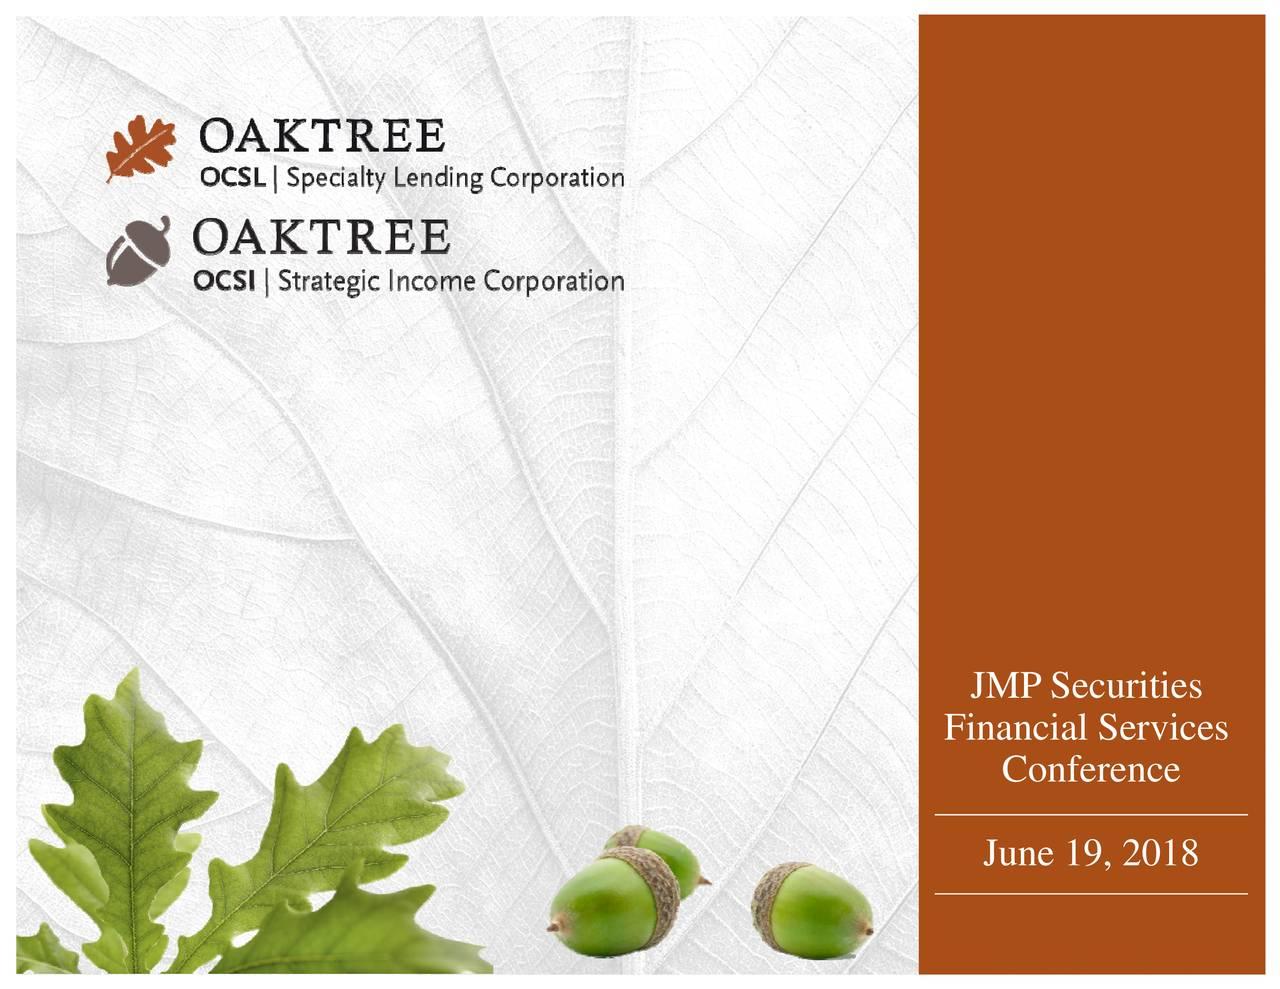 JMP Securitiese 19, 2018 Financial Services